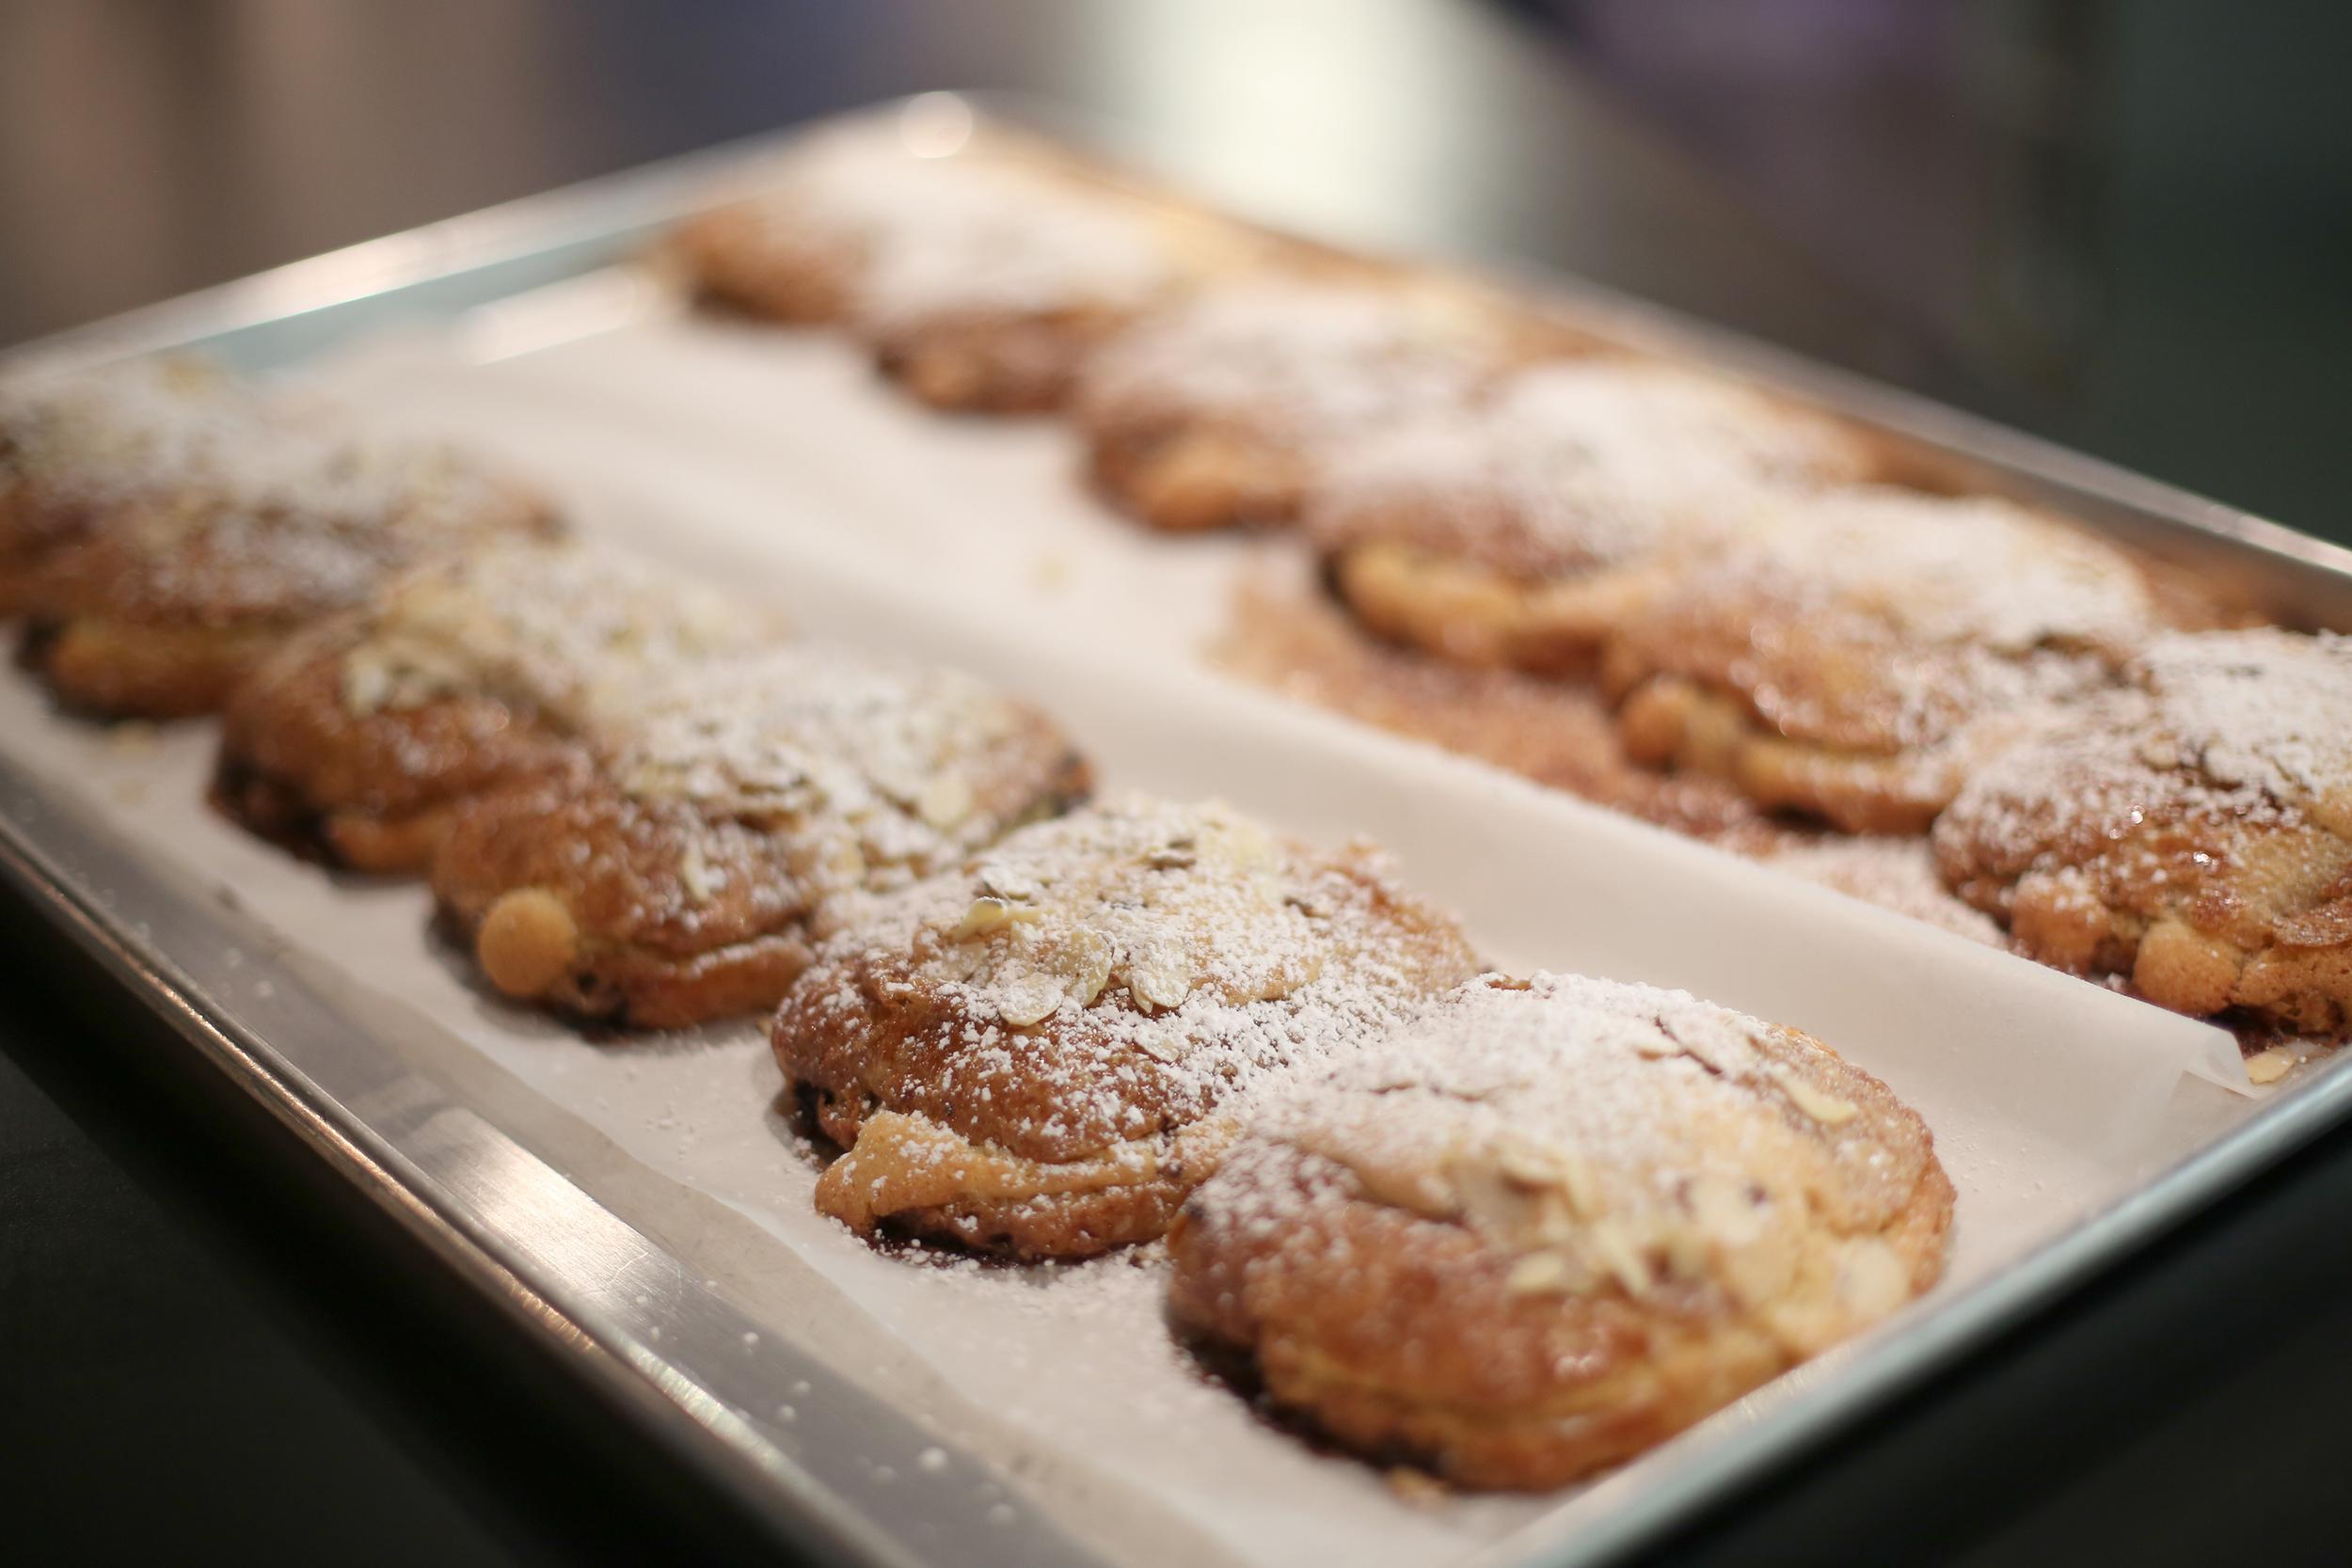 twice baked chocolate almond croissants